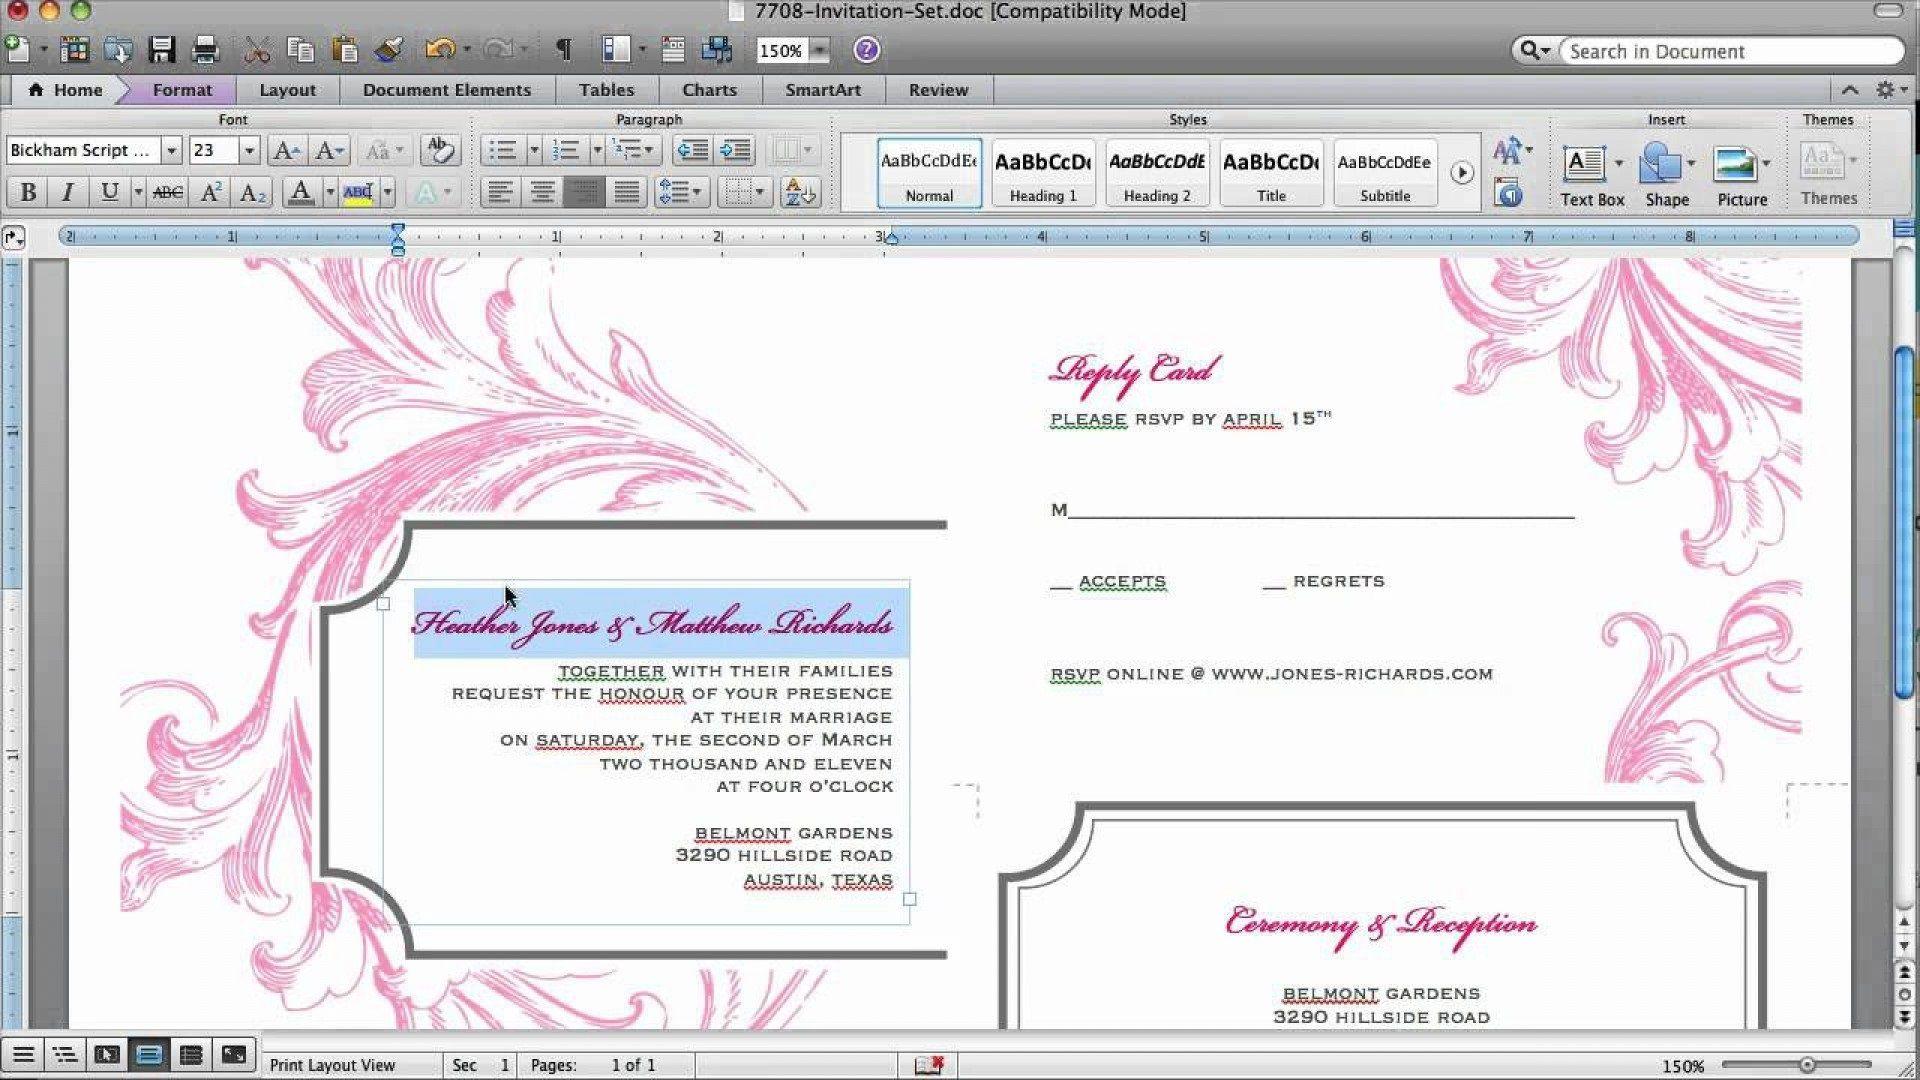 006 Impressive Microsoft Office Invitation Maker Photo Full